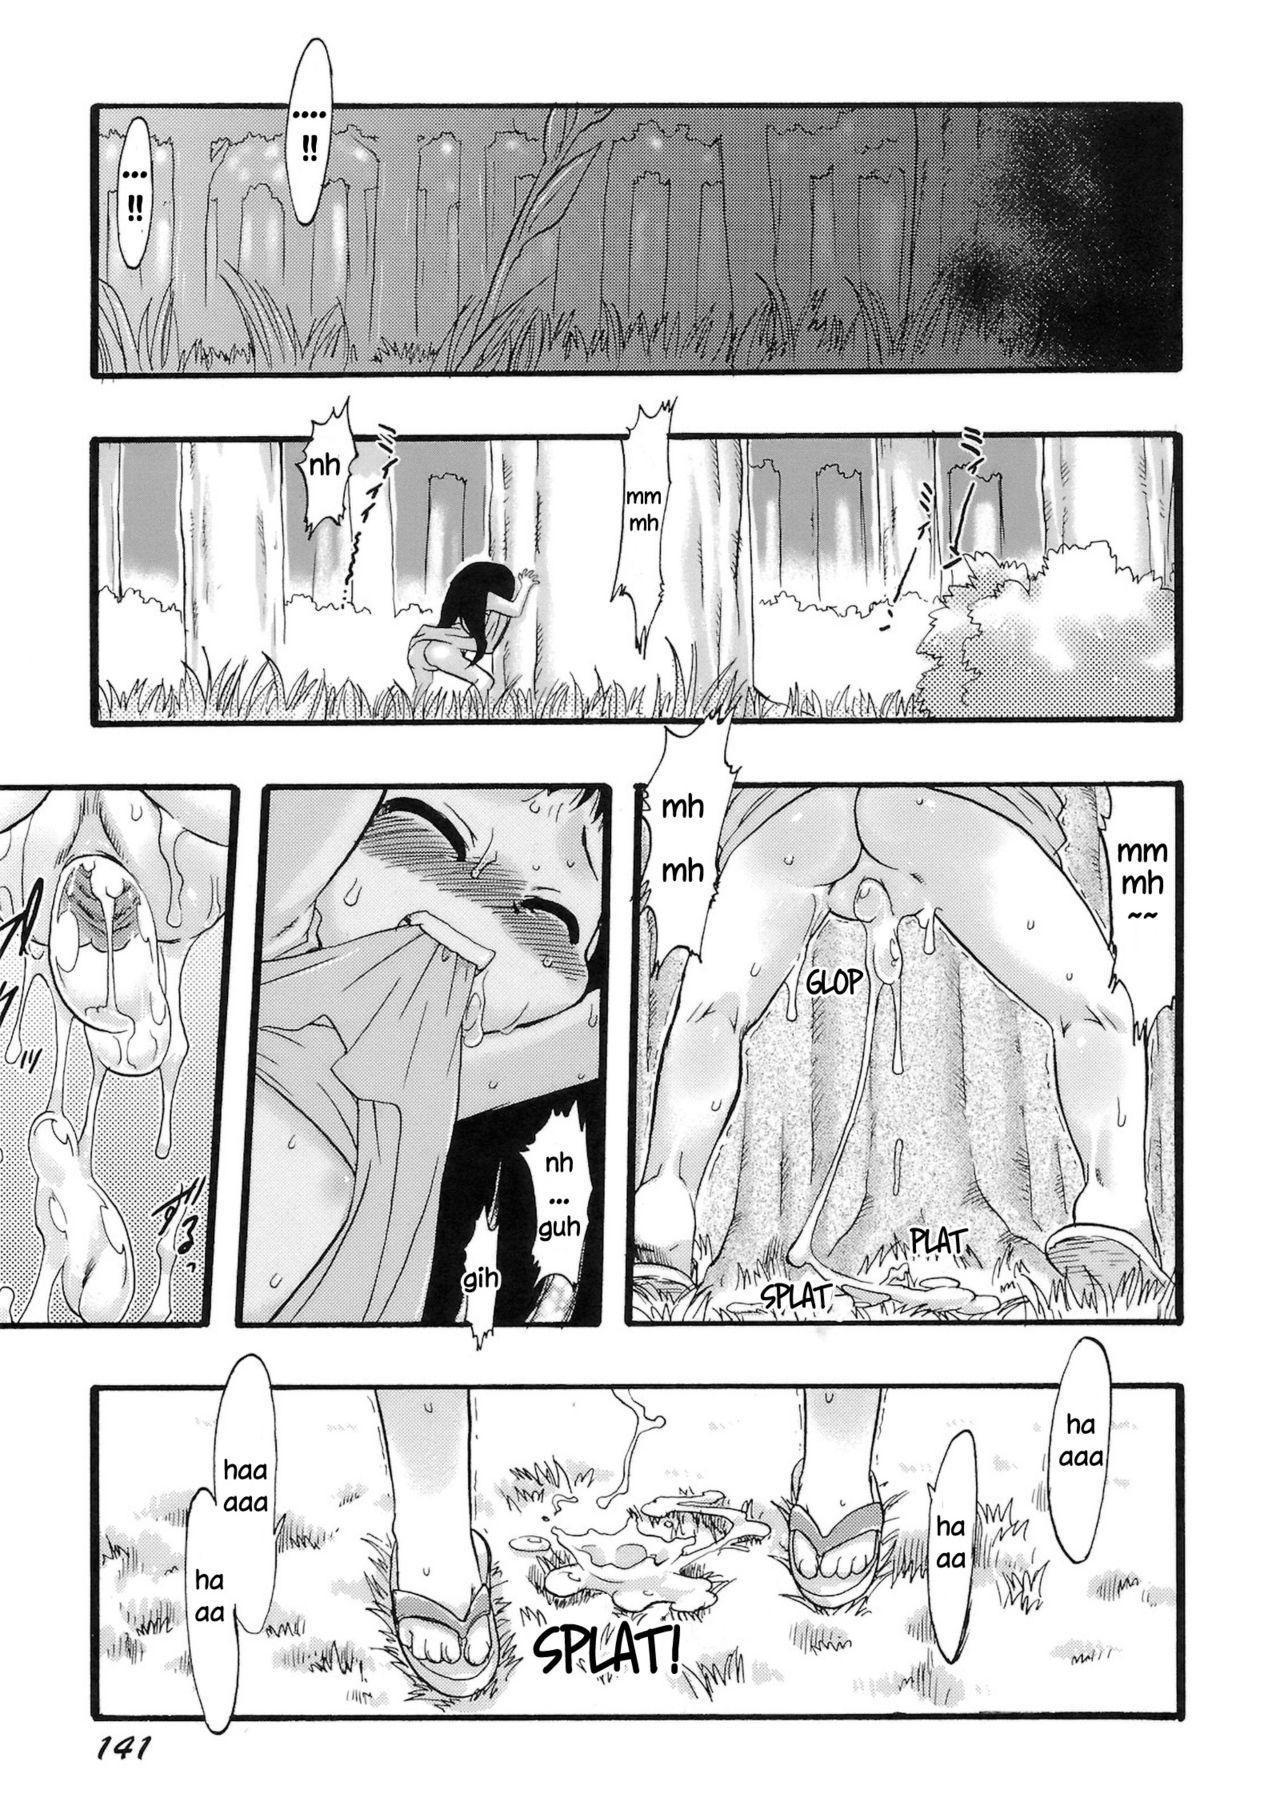 [Teruki Kuma] Osanaki Hana - Kami Haramishi Otome Ch. 1-5.5 [English] [Hige] 140